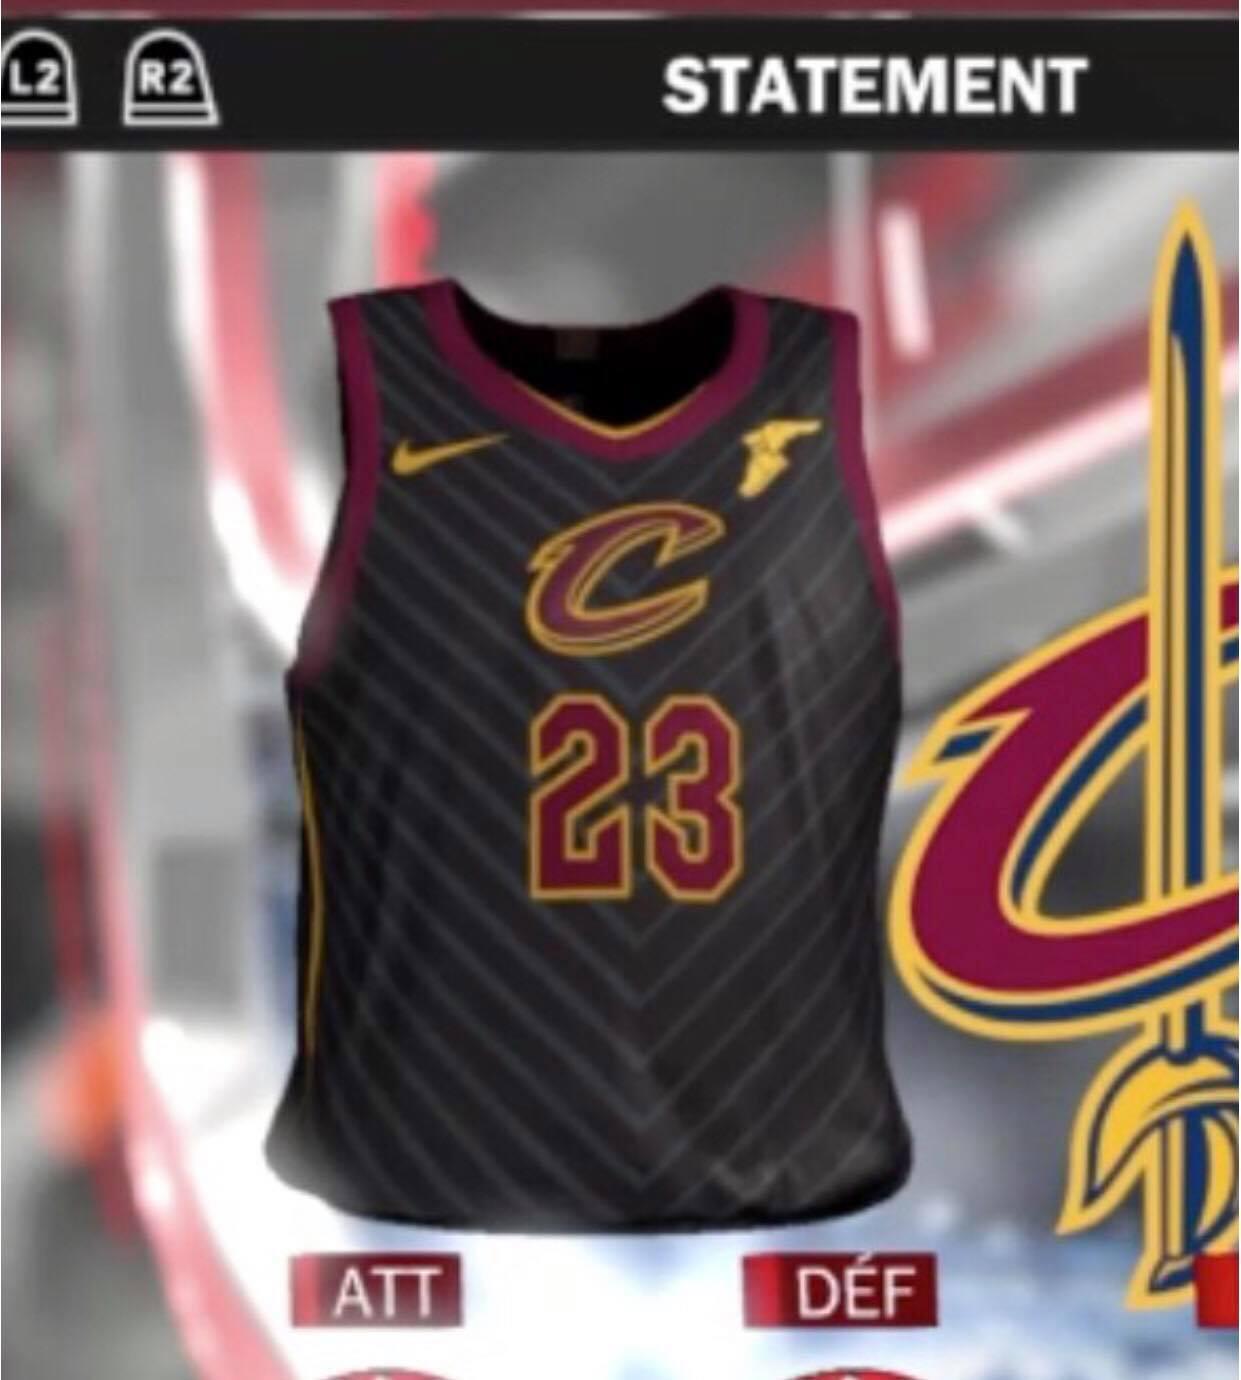 Sneak Peak of the Nike NBA 'Statement' Jerseys